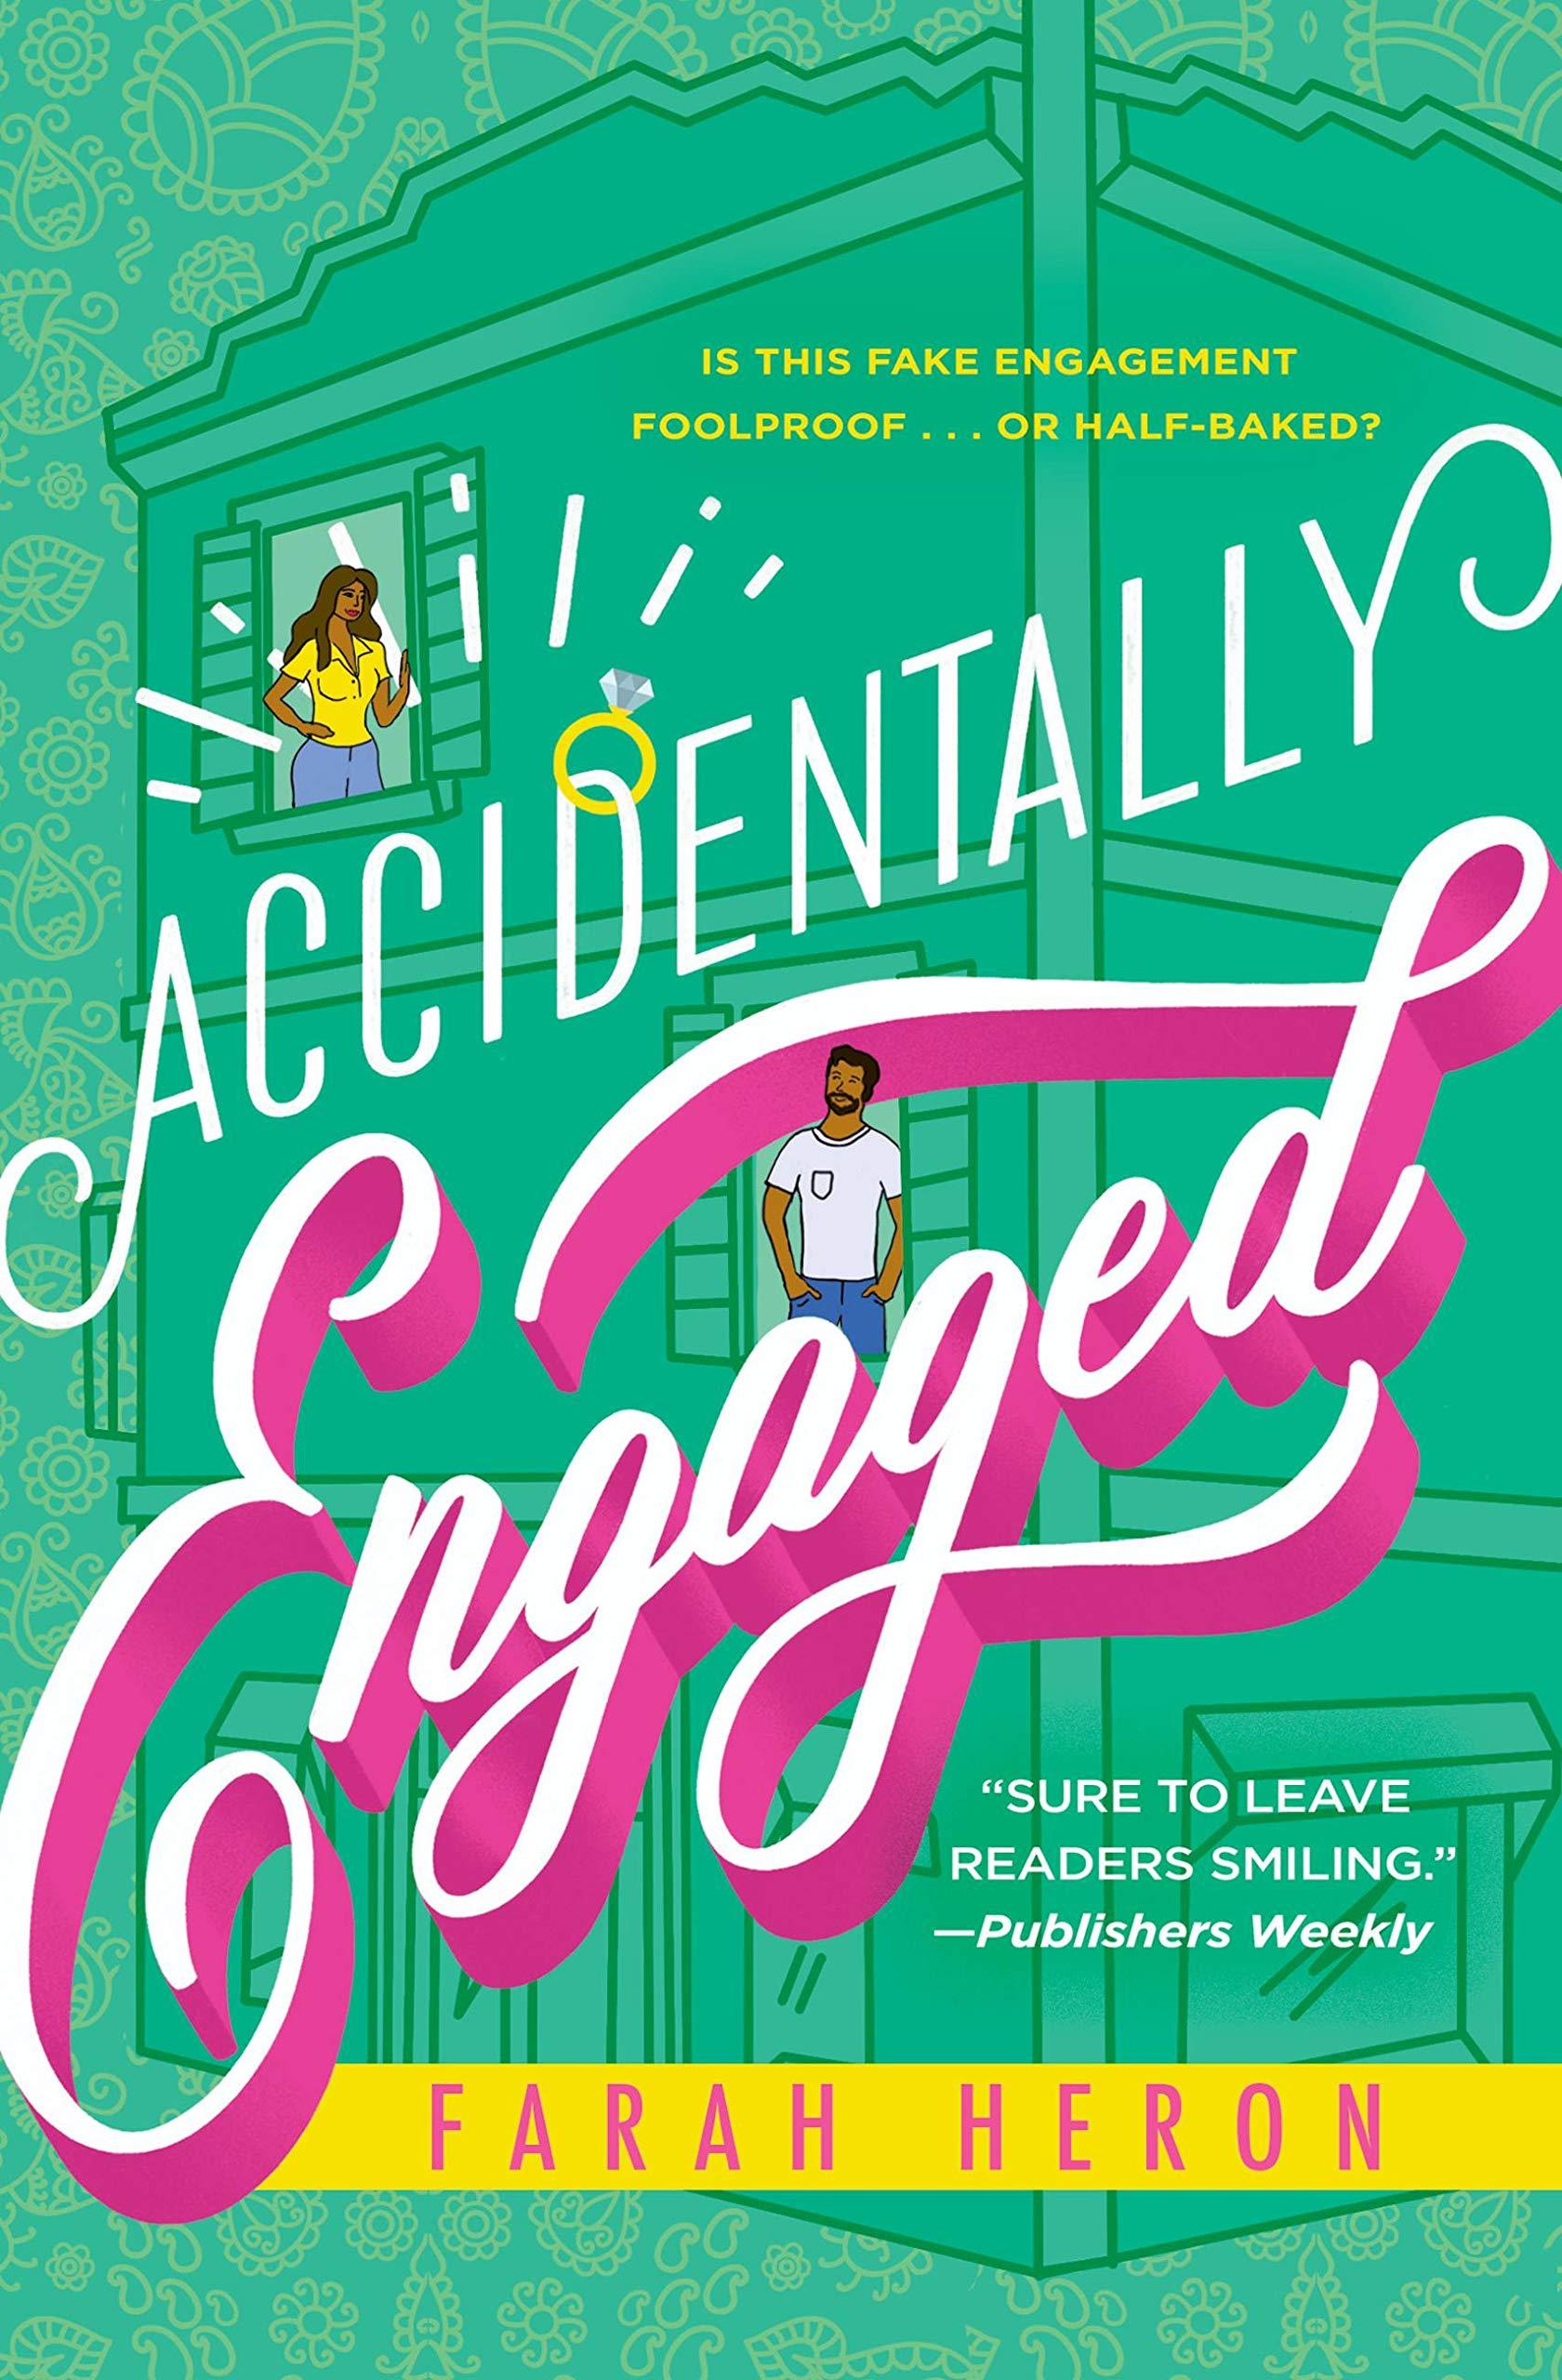 Accidentally Engaged: Heron, Farah: 9781538734988: Amazon.com: Books